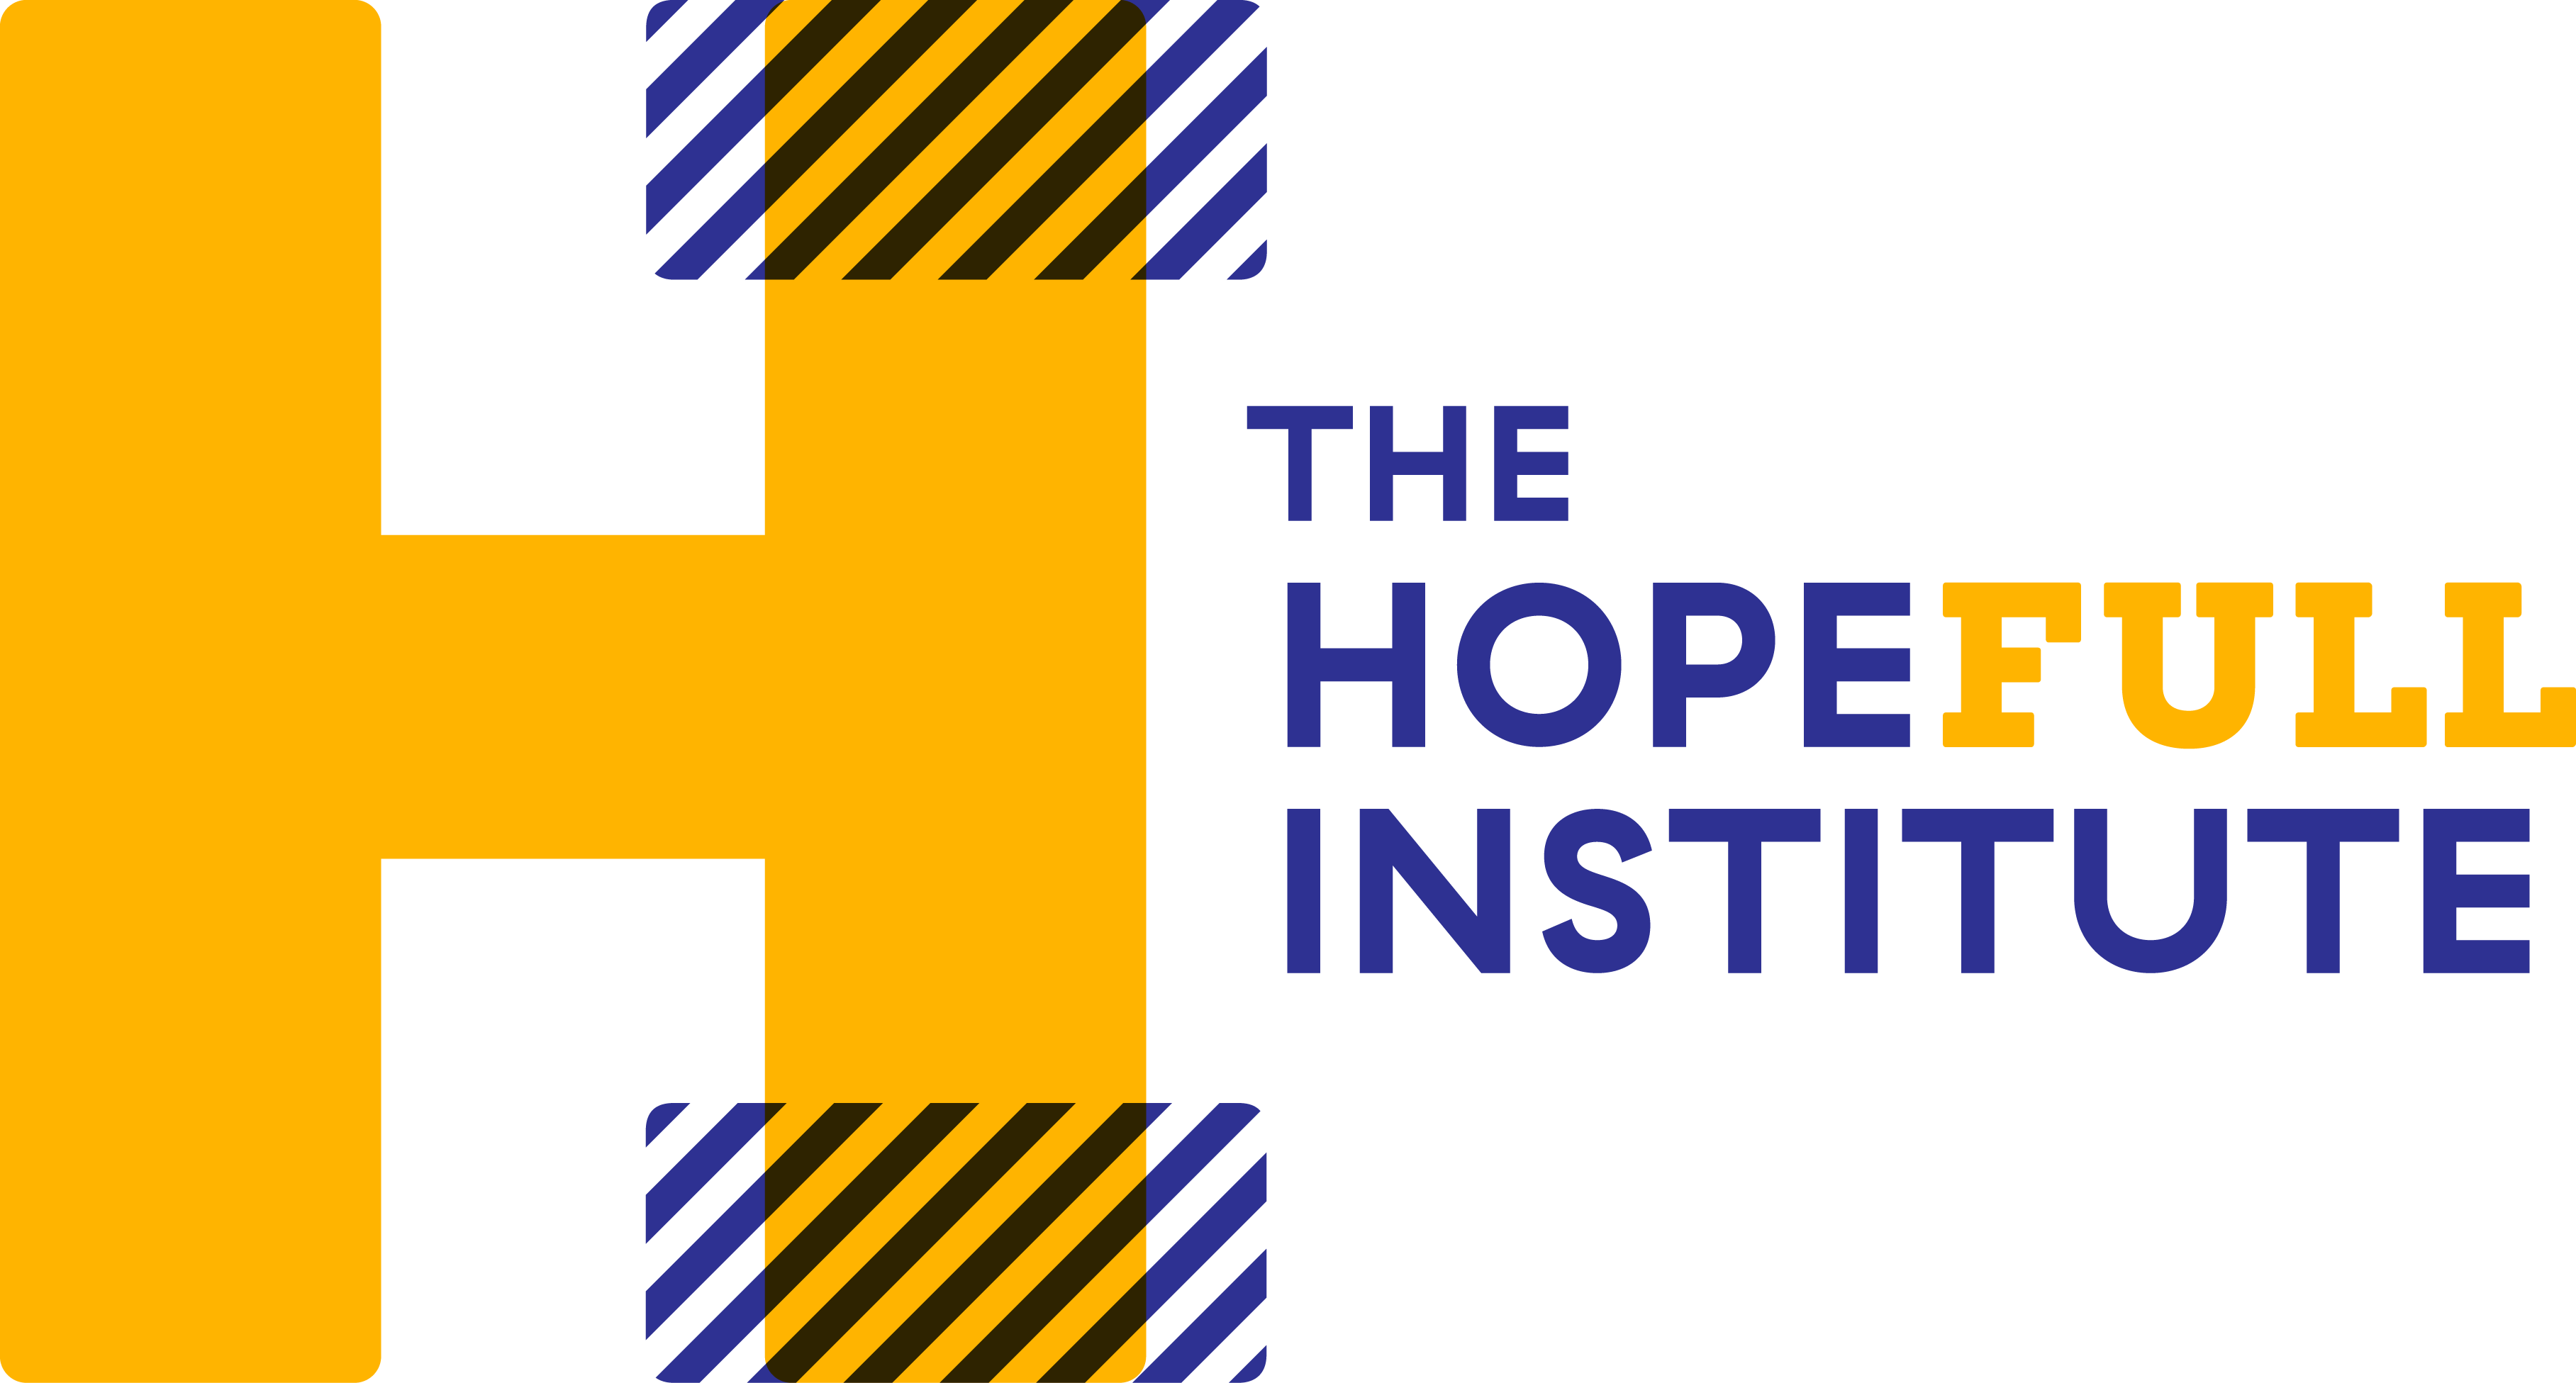 https://www.thehopefullinstitute.com